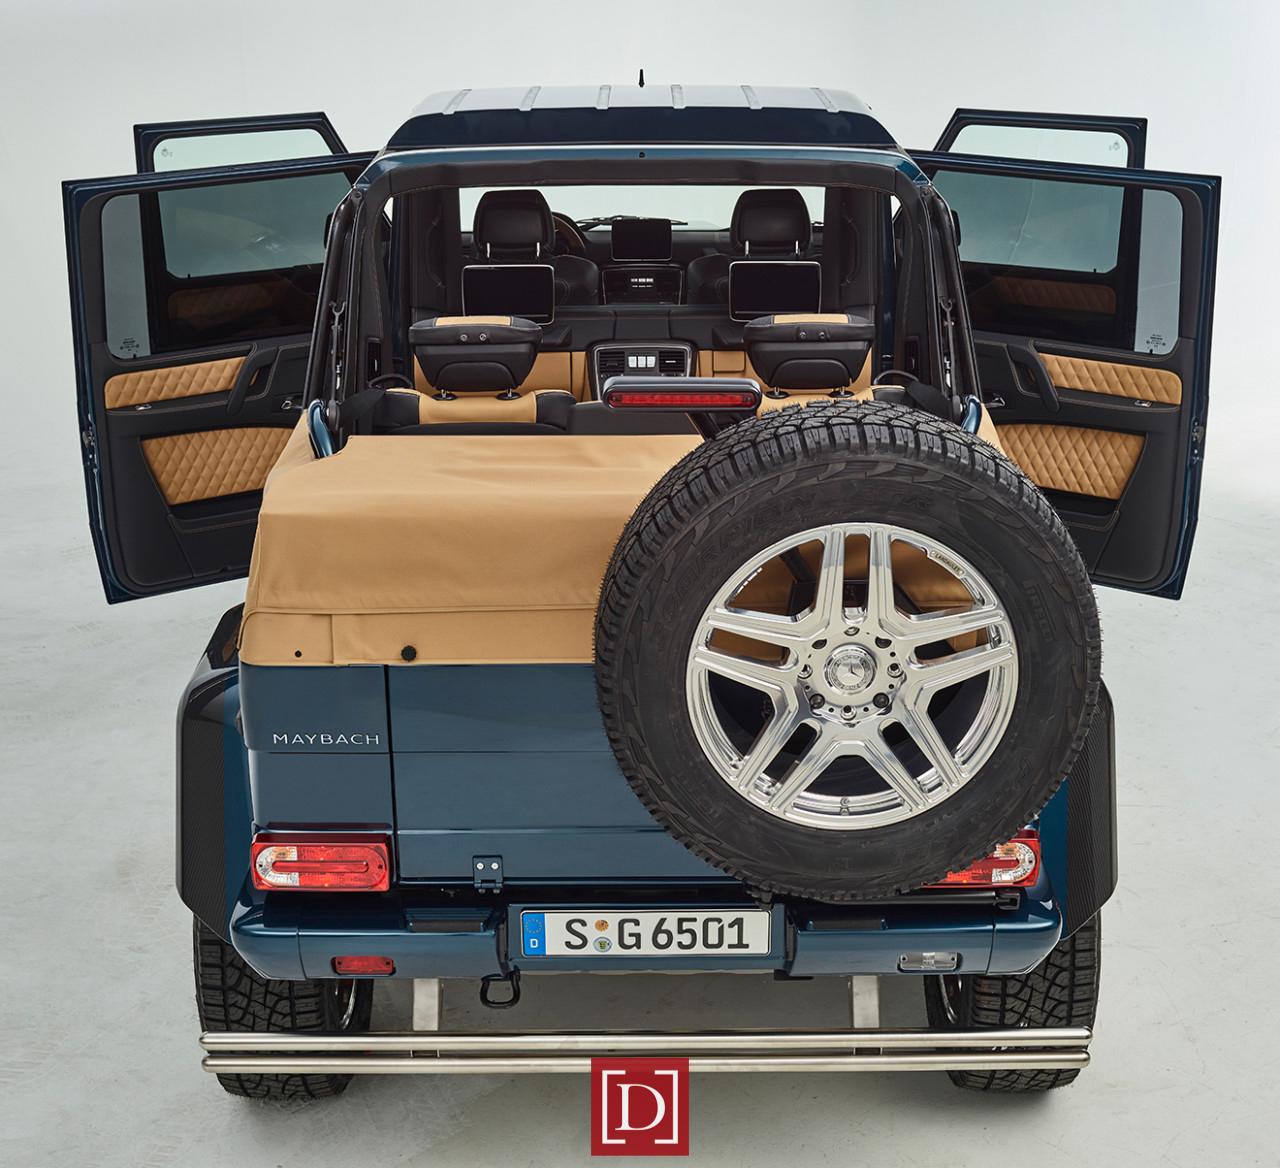 03-mercedes-benz-vehicles-mercedes-maybach-g-650-landaulet-w-463-1320x1204-1280x1168